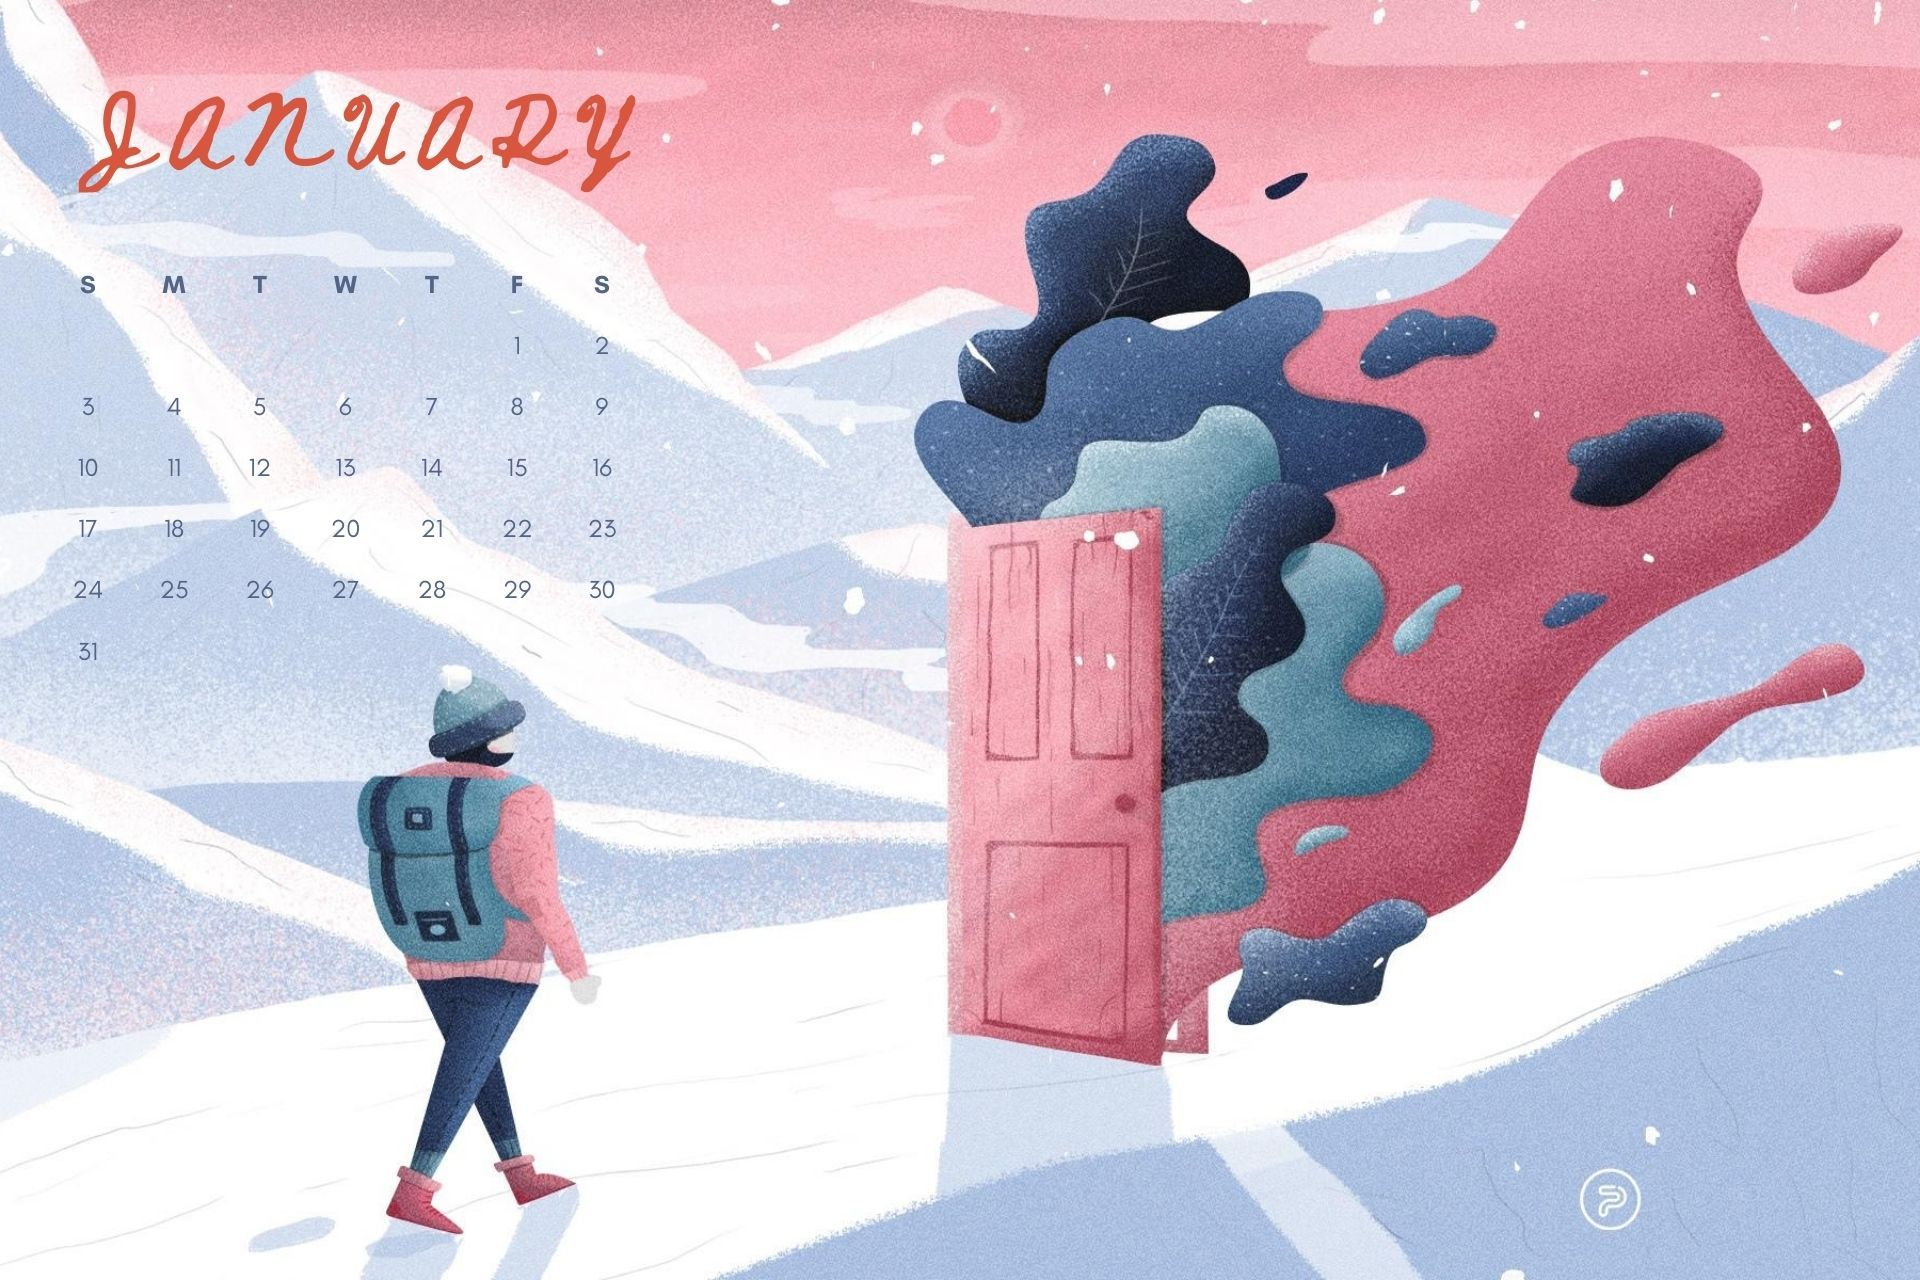 January 2021 Calendar winter wallpaper download in HD in 2020 1920x1280